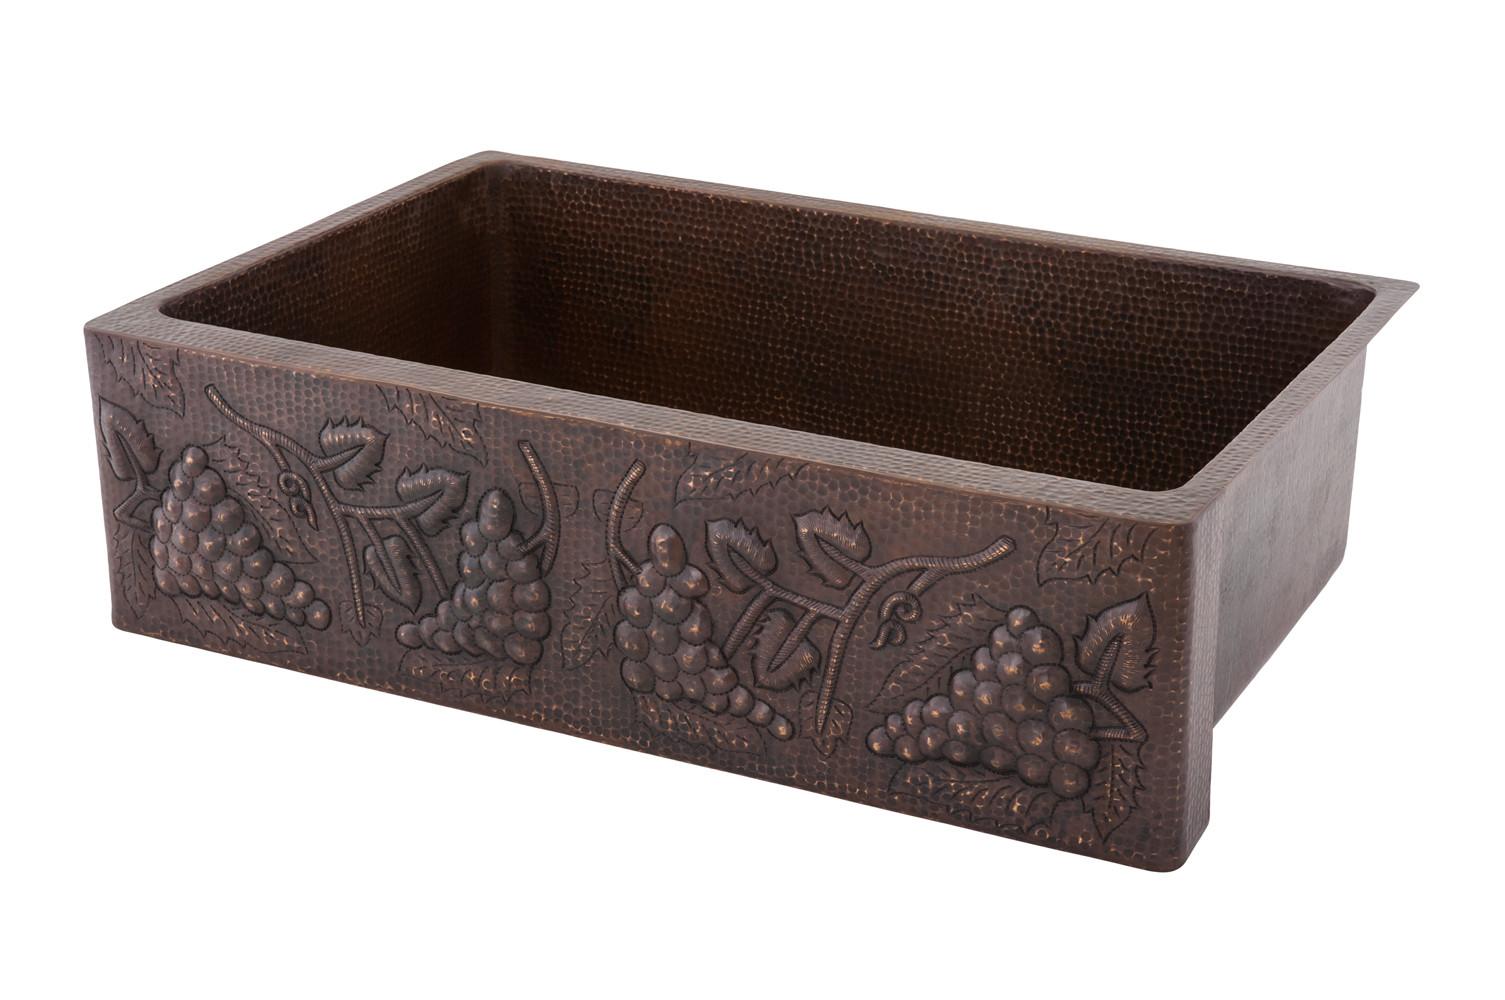 KASDB33229G Decorative Copper Farm Sink